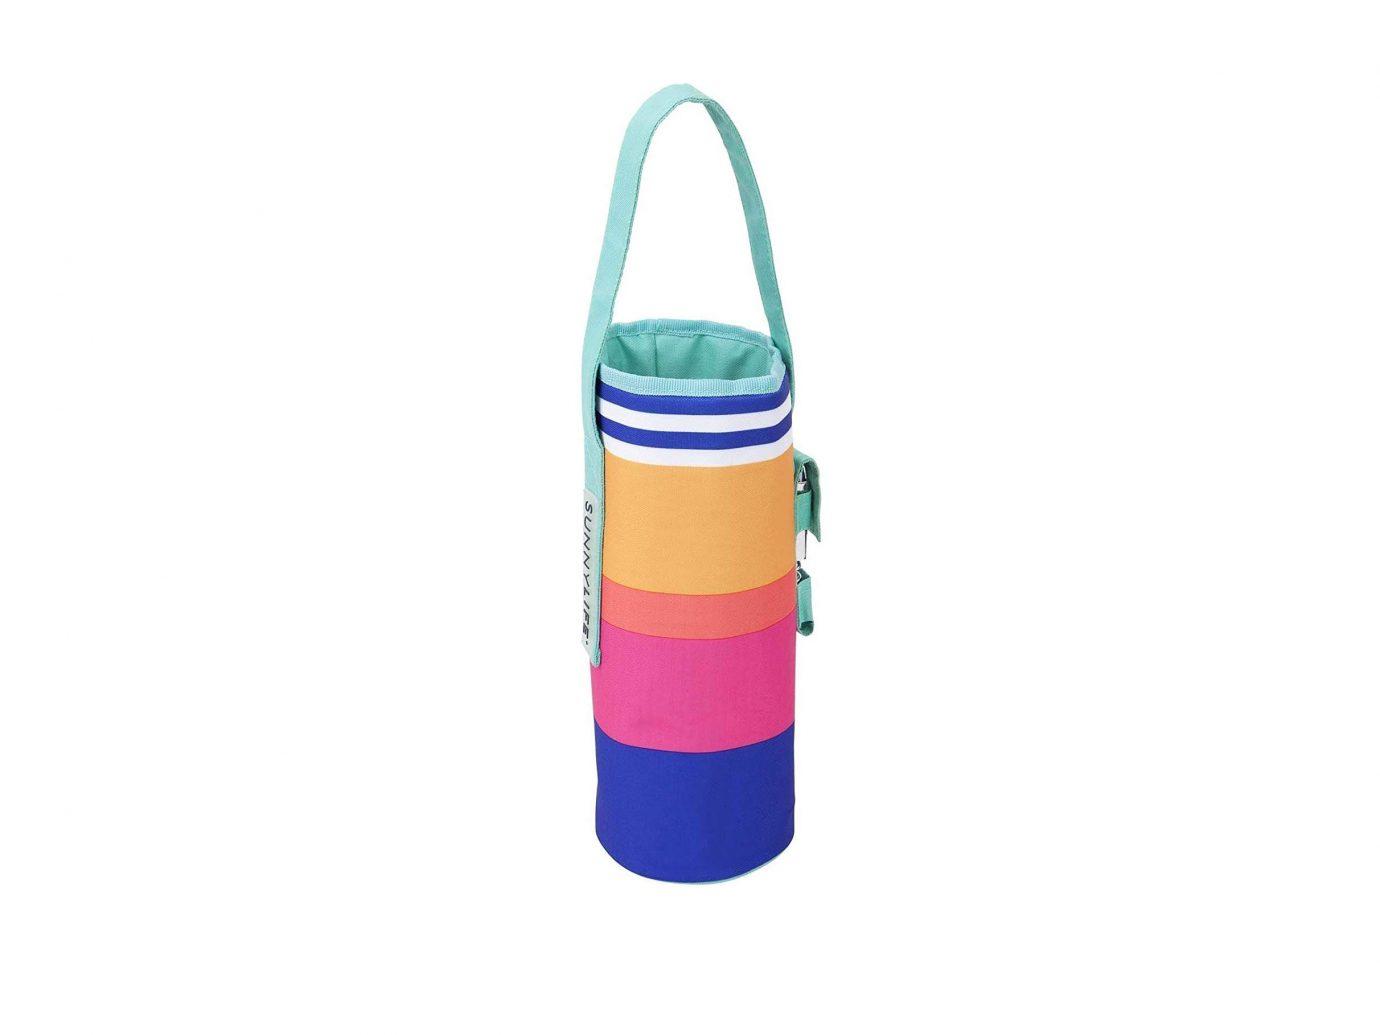 Sunnylife Bottle Tote Cooler